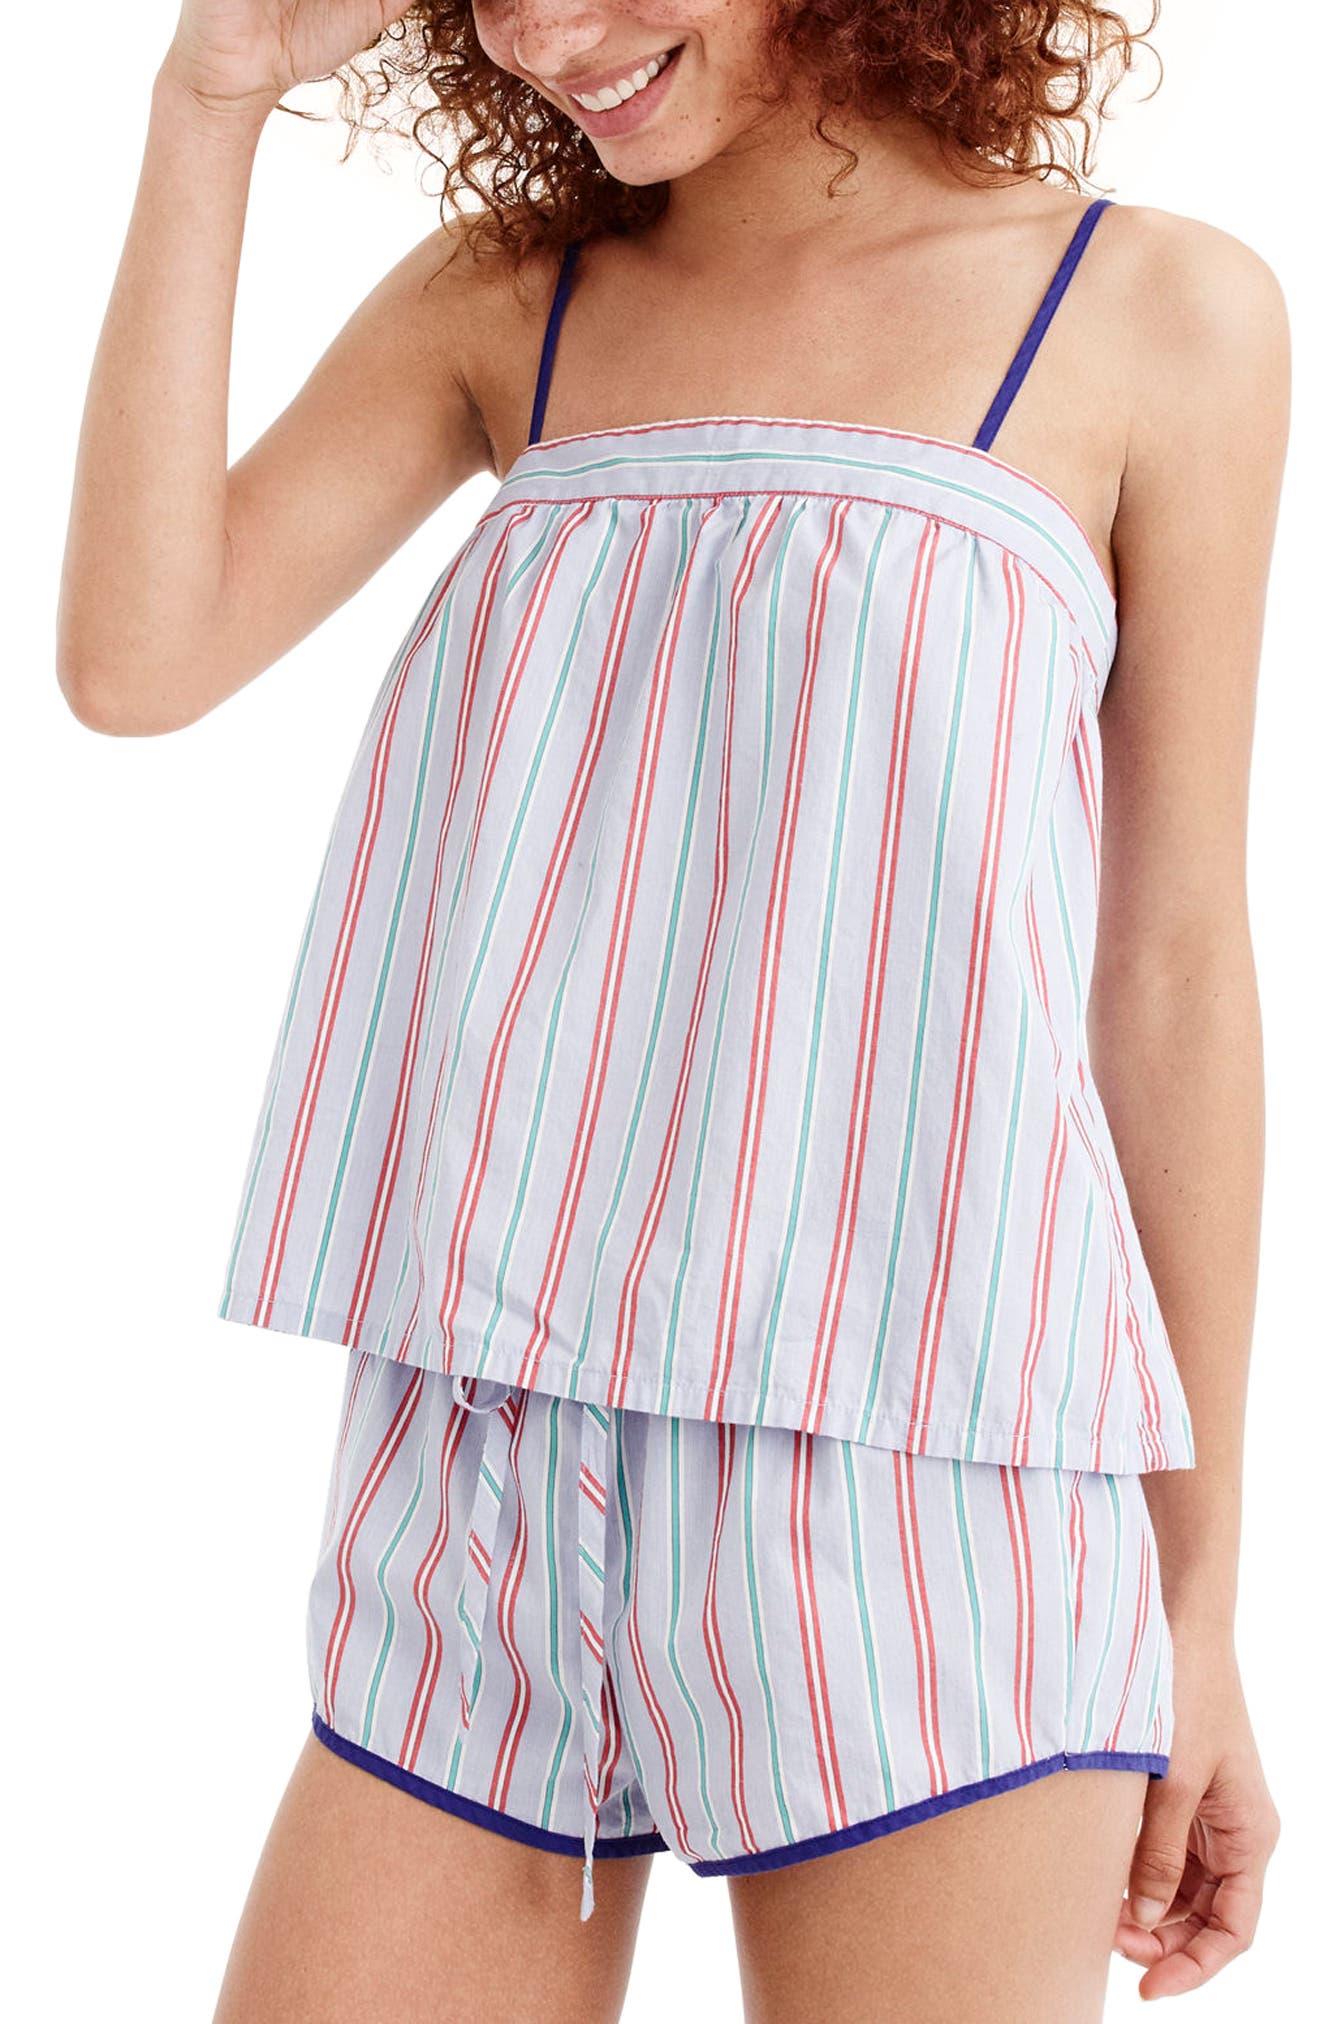 J.Crew Candy Stripe Short Pajamas,                         Main,                         color, Holiday Stripe